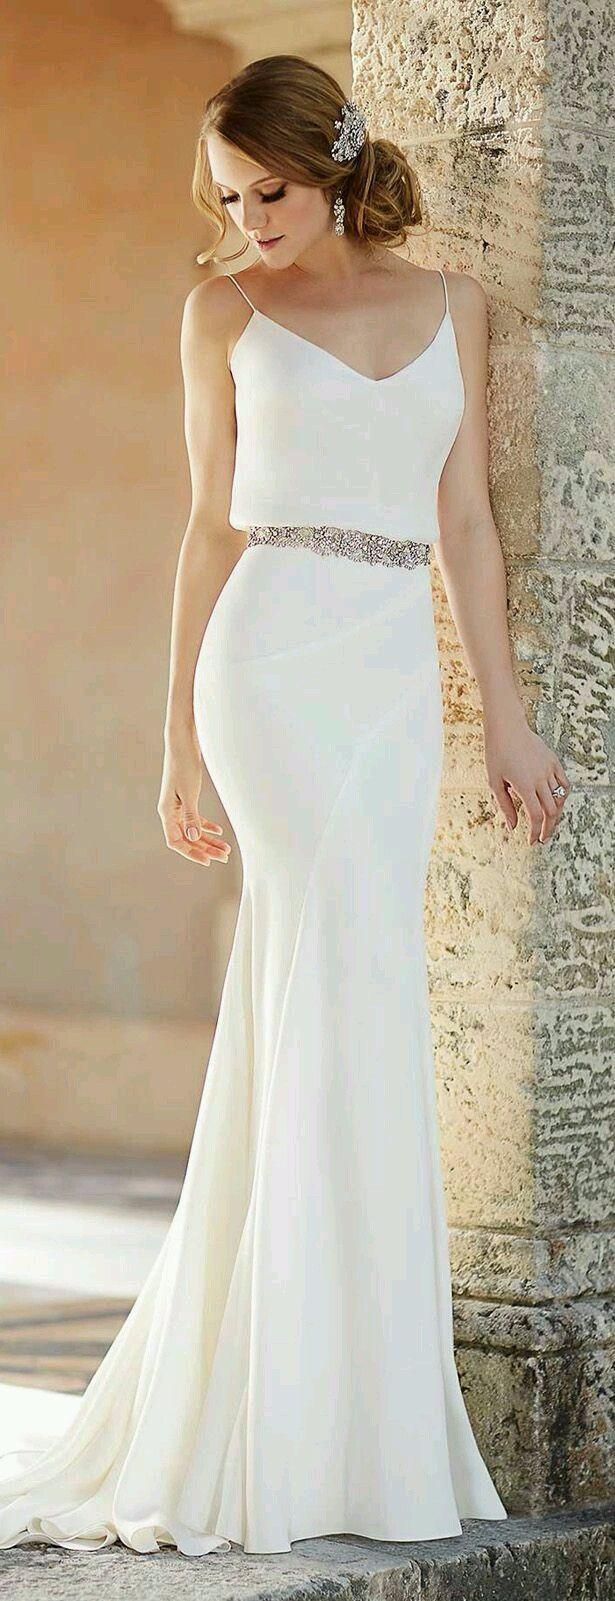 Wedding - Dress Party